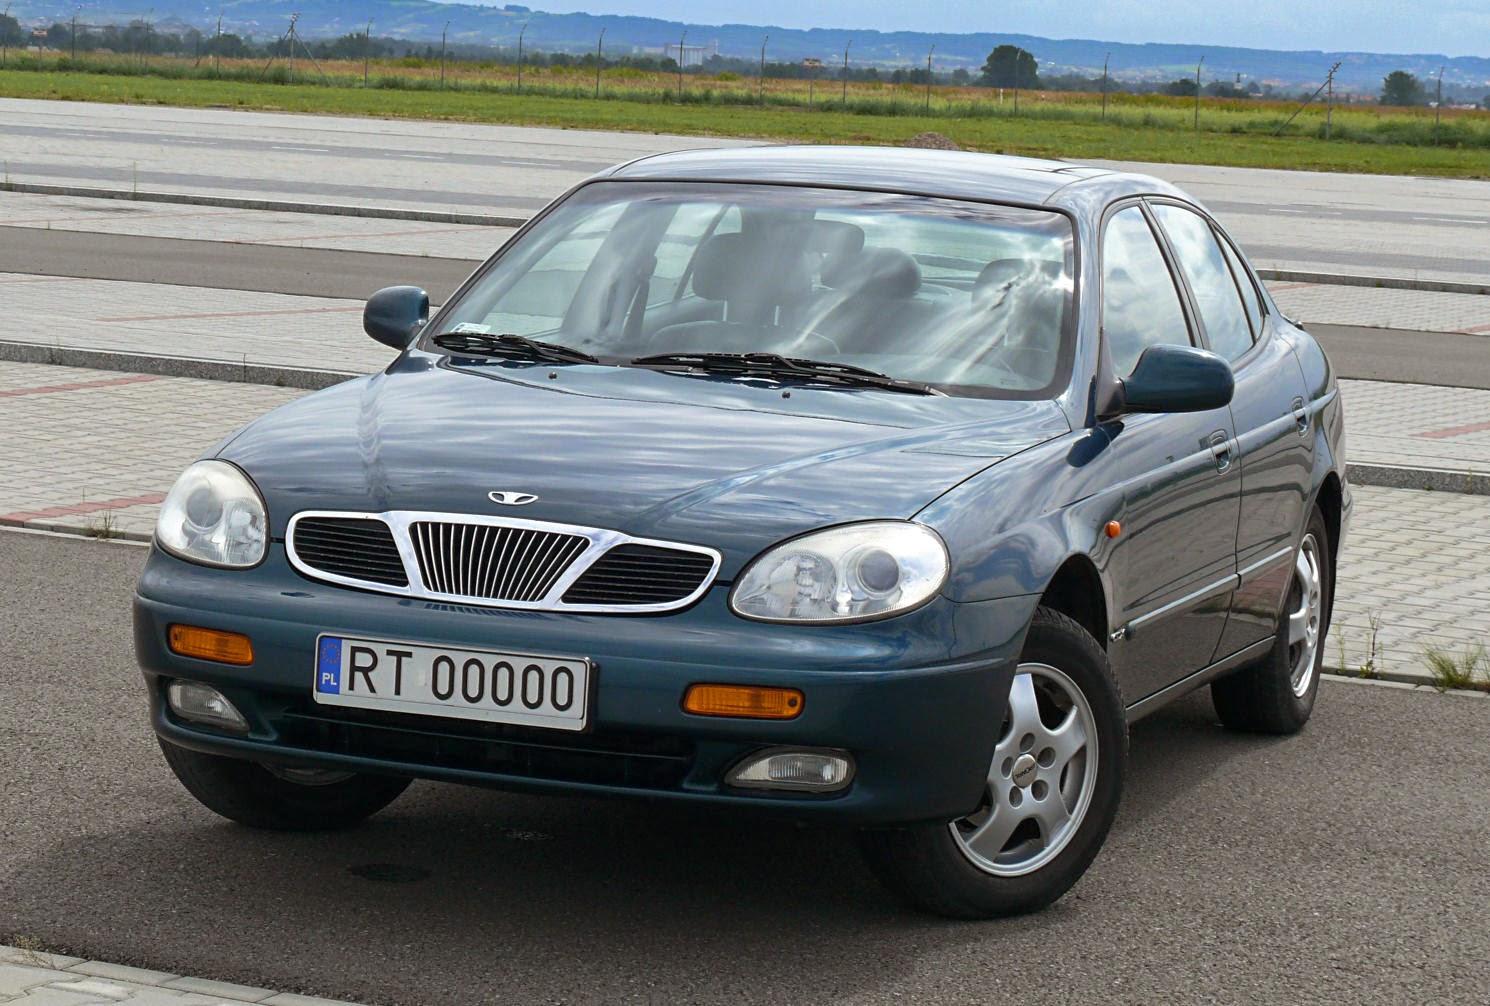 Daewoo Motor's 1997 Leganza